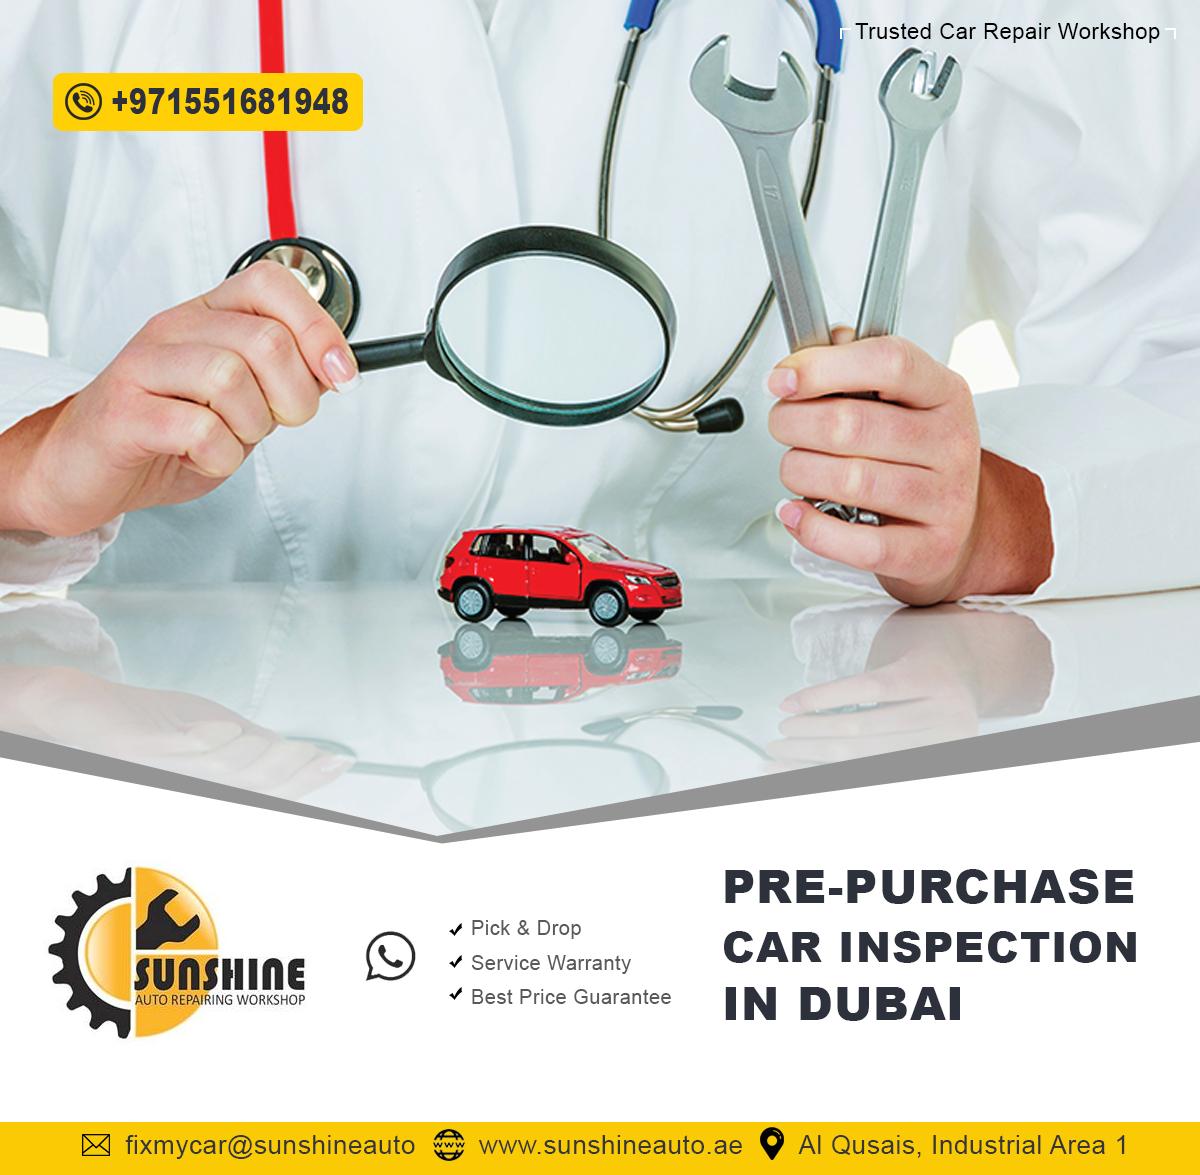 Vehicle Pre-Purchase Inspections - Sunshine Auto Car Repair Workshop